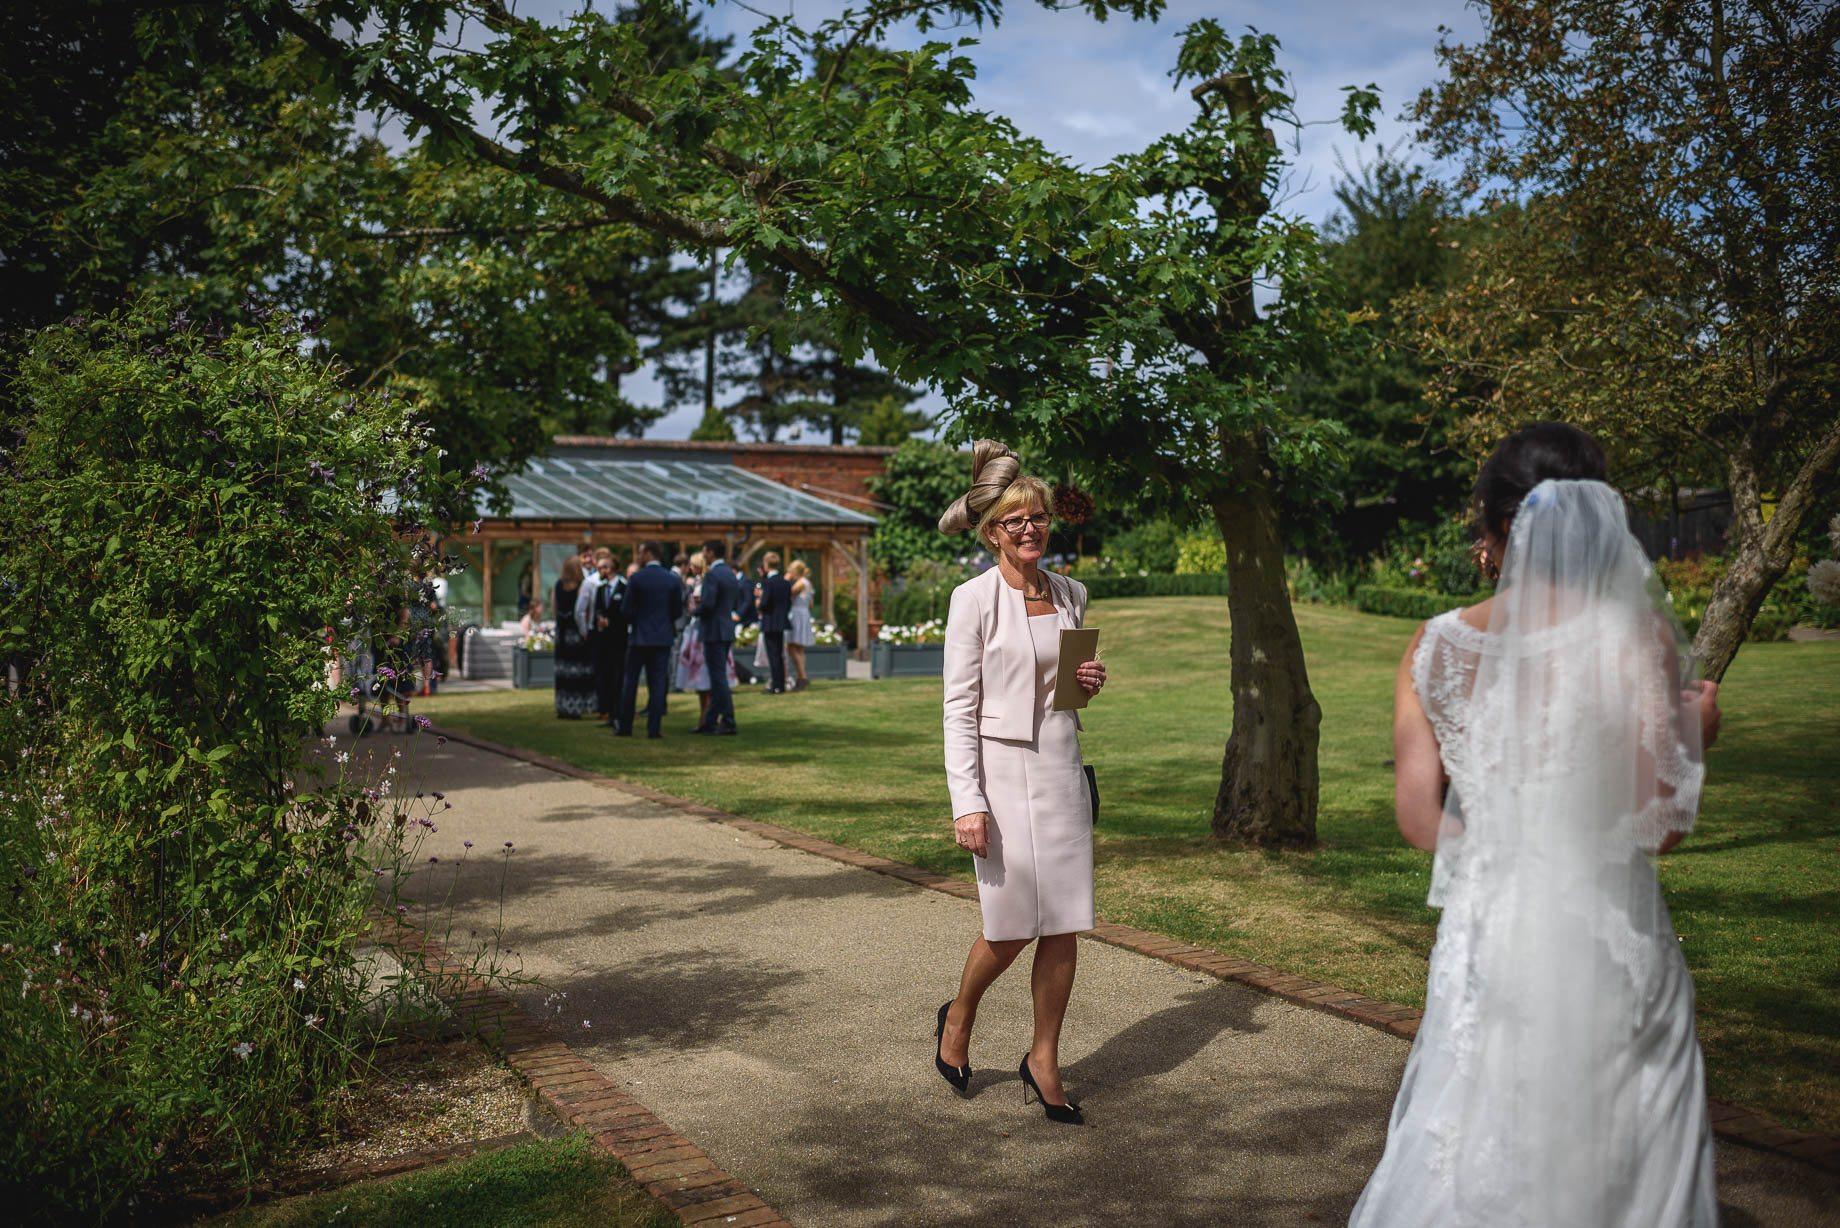 Gaynes Park wedding photography - Guy Collier Photography - Rachel and Jon (95 of 169)